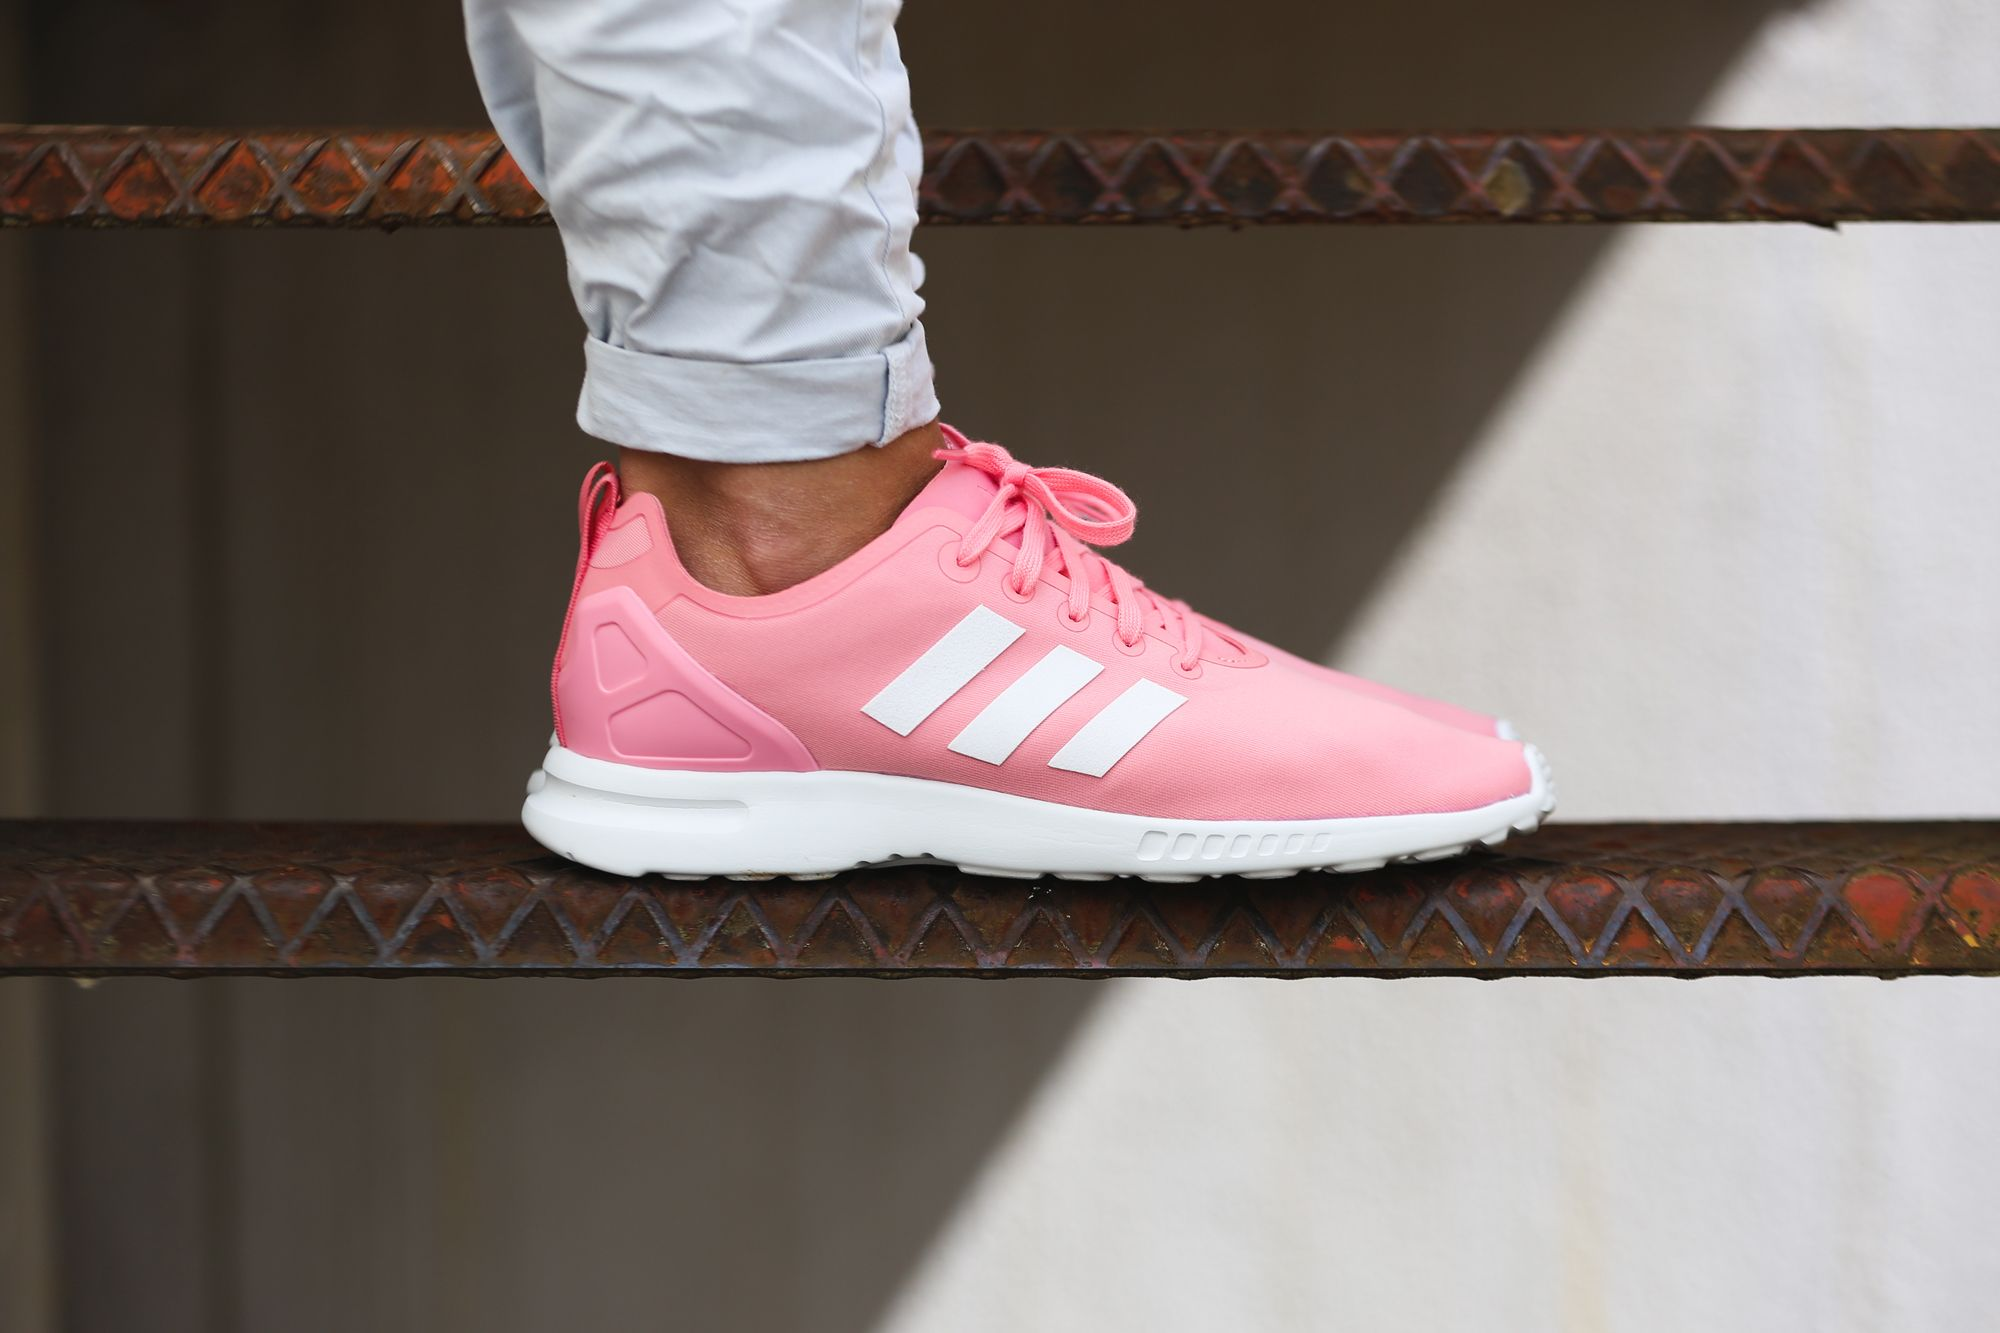 flux adidas rosa